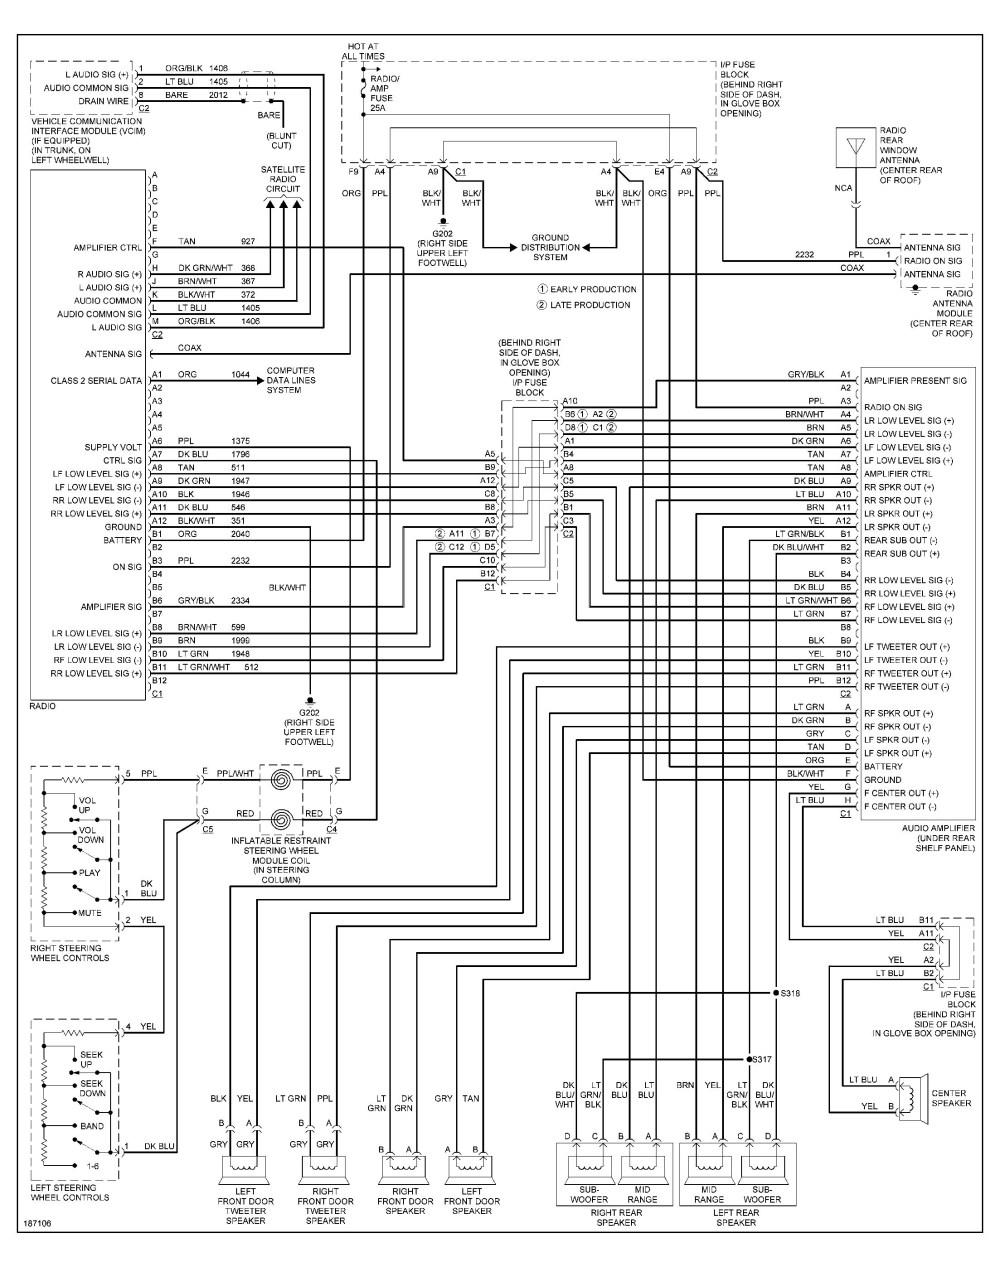 medium resolution of 1977 pontiac grand prix electrical diagram wiring diagram